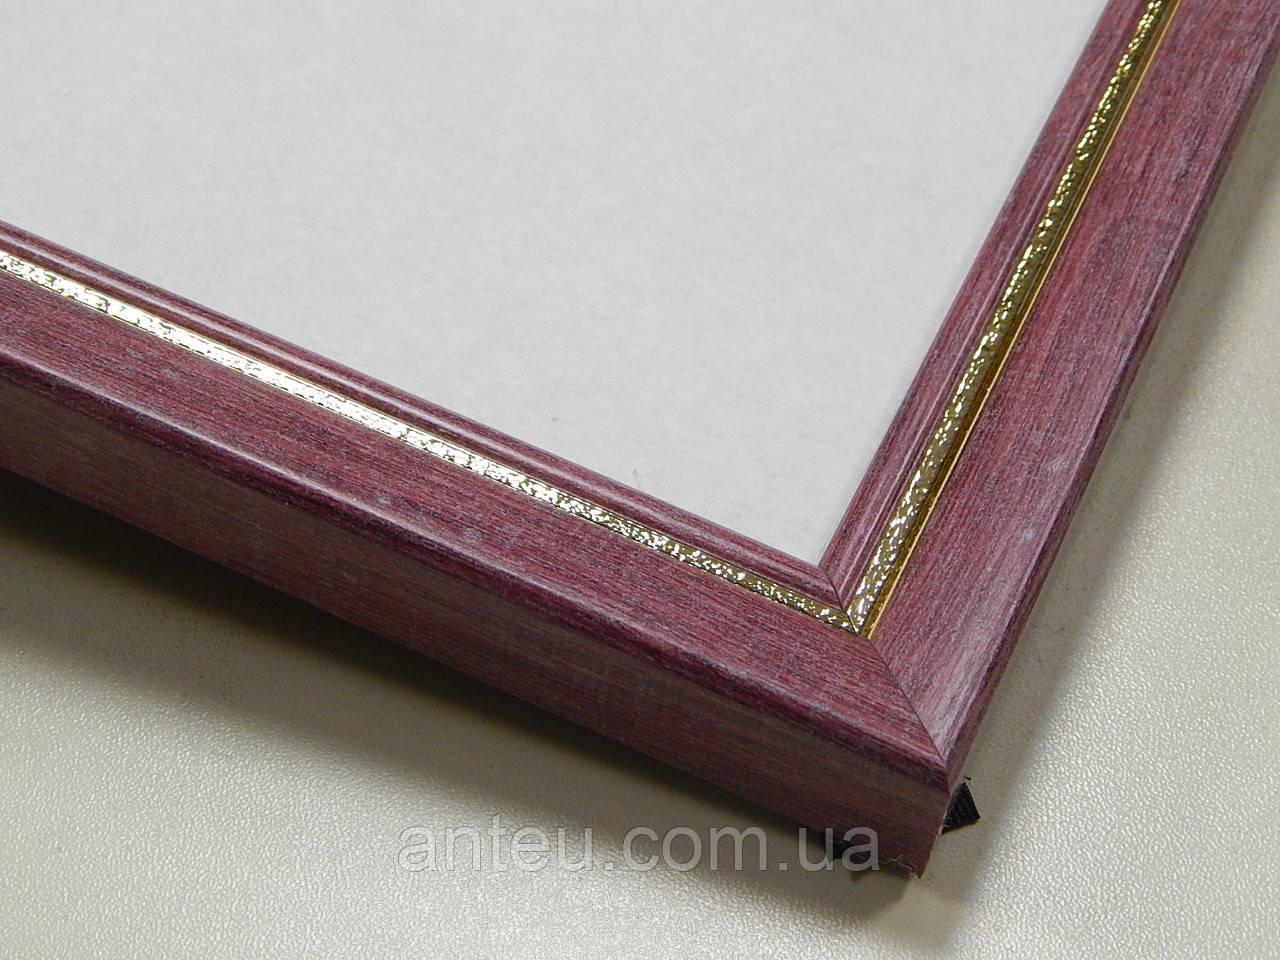 Рамка А3 (297х420).Бордо с золотом.22 мм.